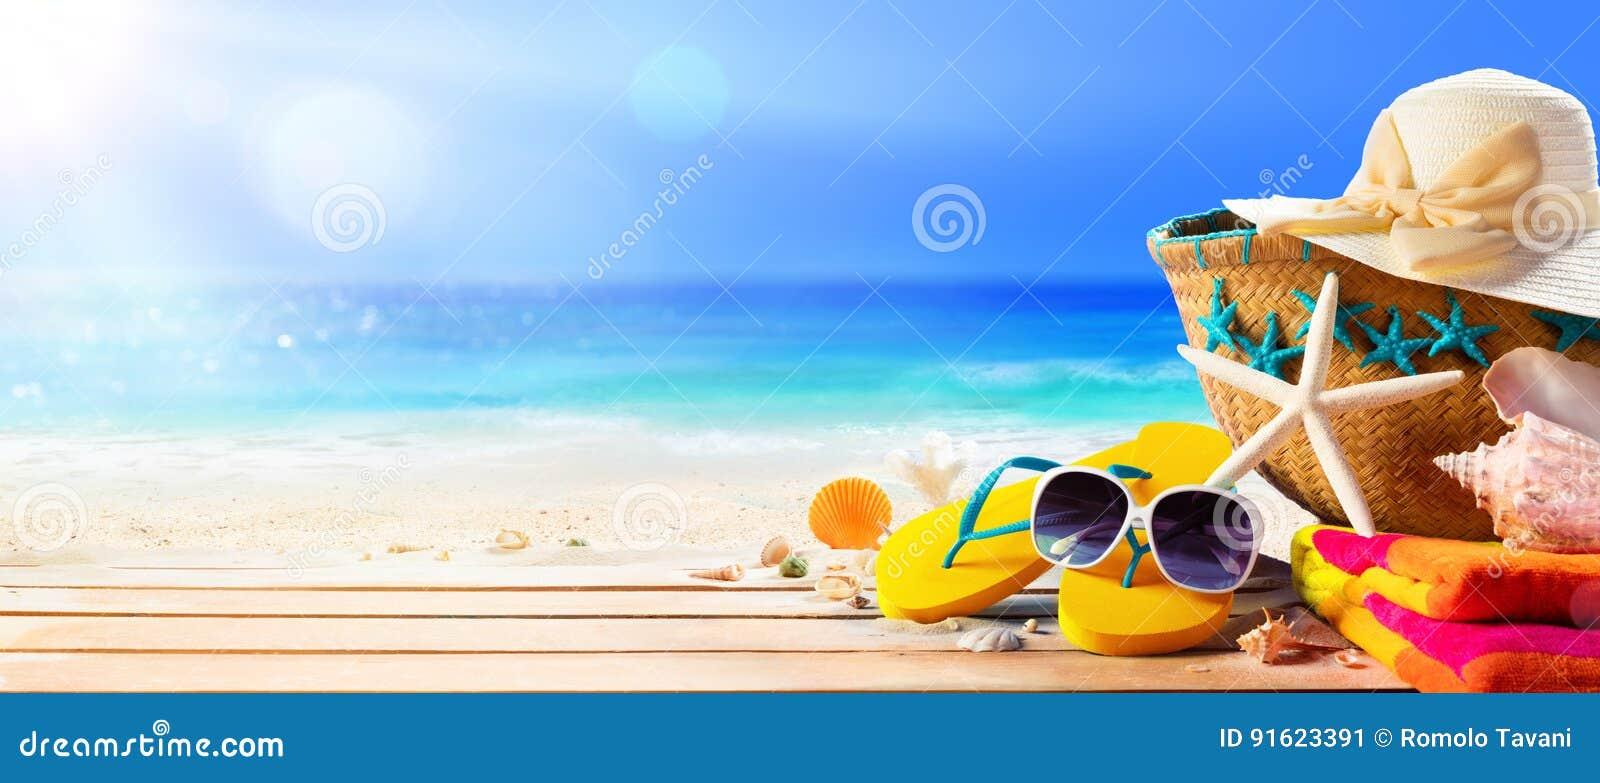 Acessórios da praia na praia da plataforma